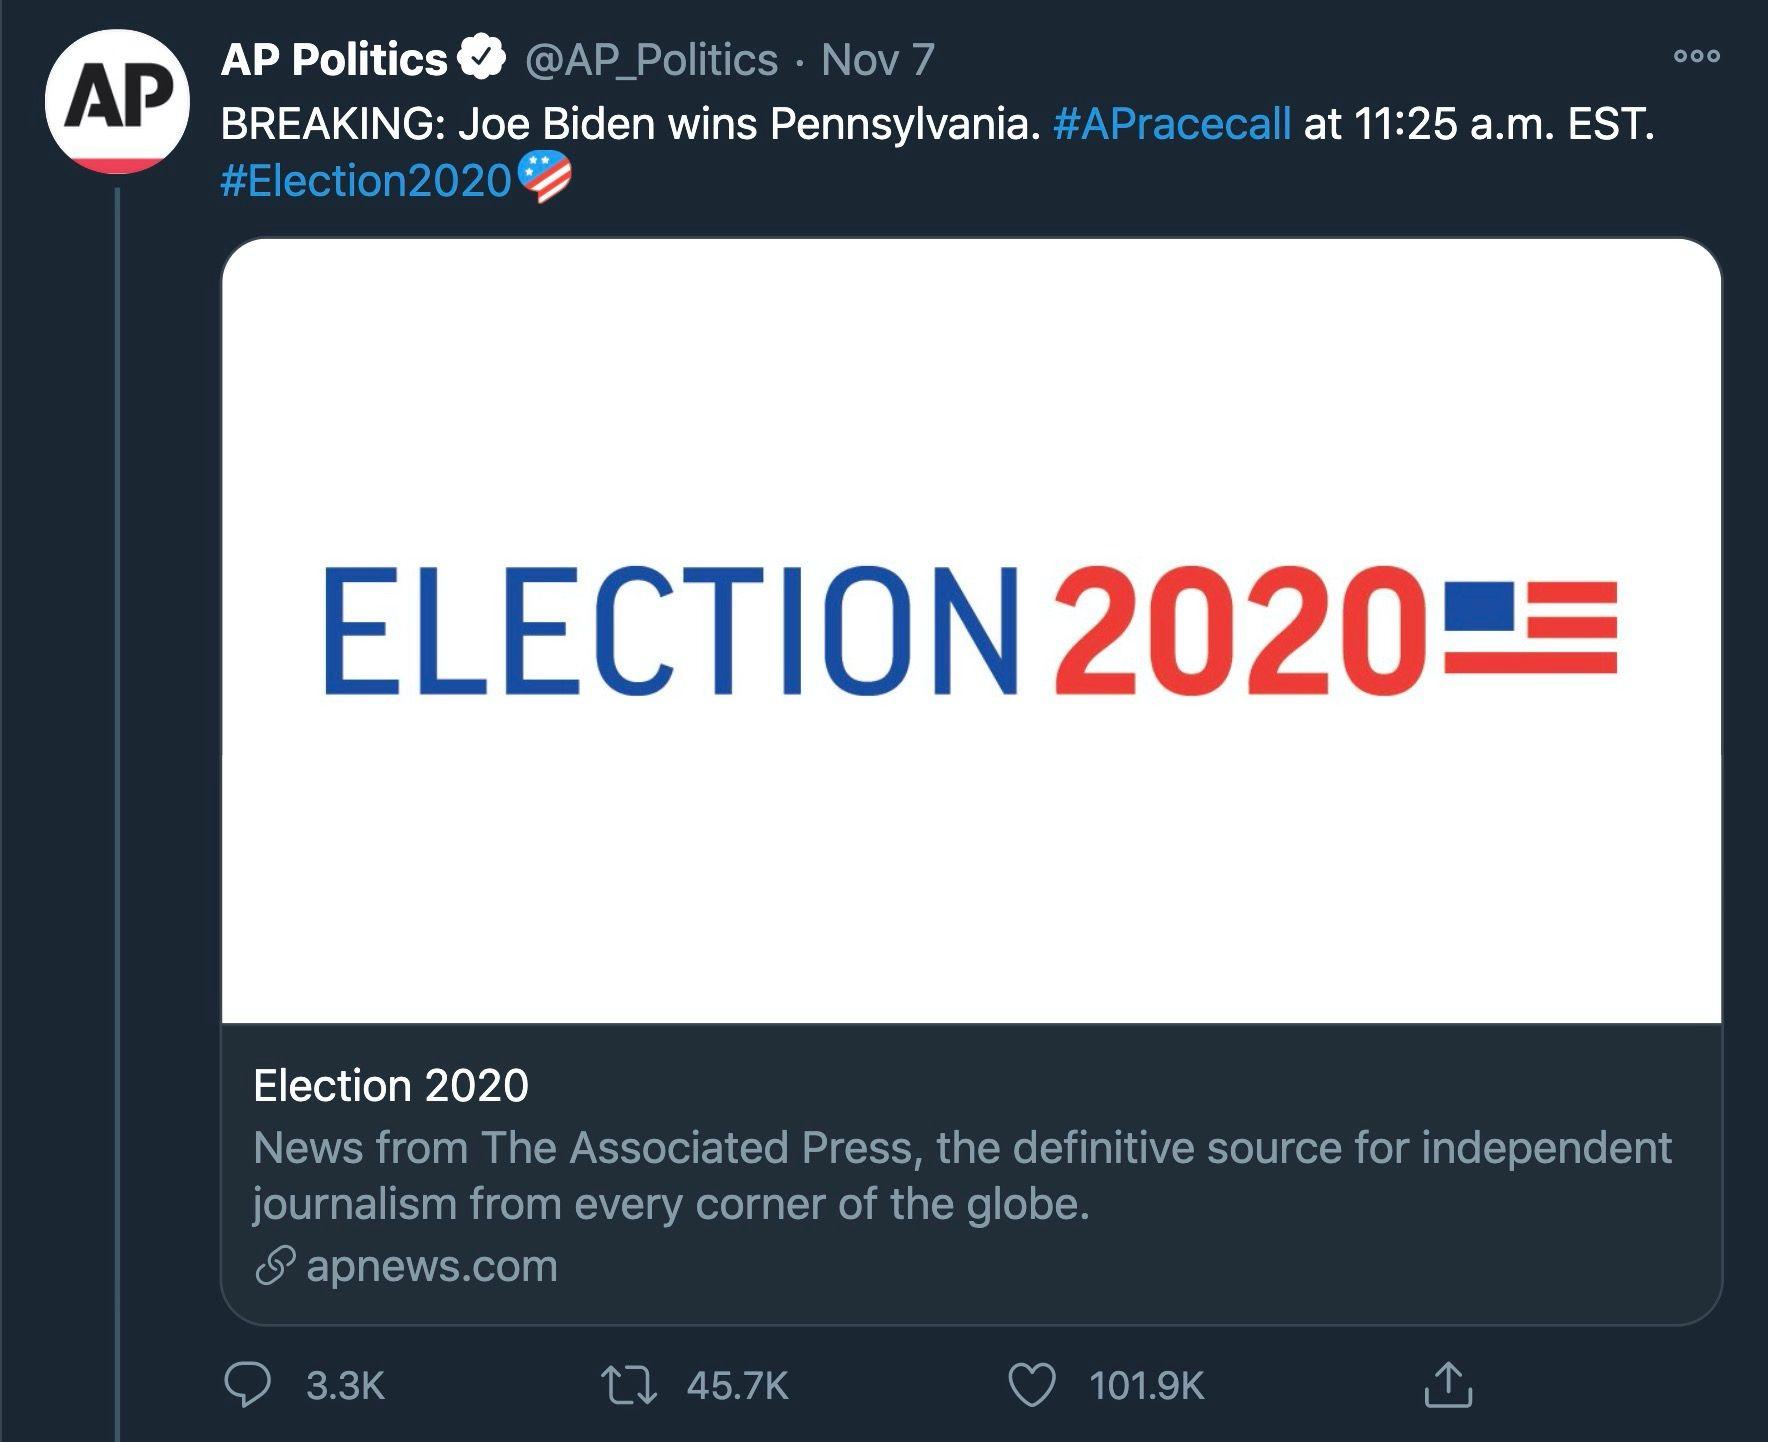 [https://twitter.com/AP_Politics/status/1325112441928359939](ap tweet)